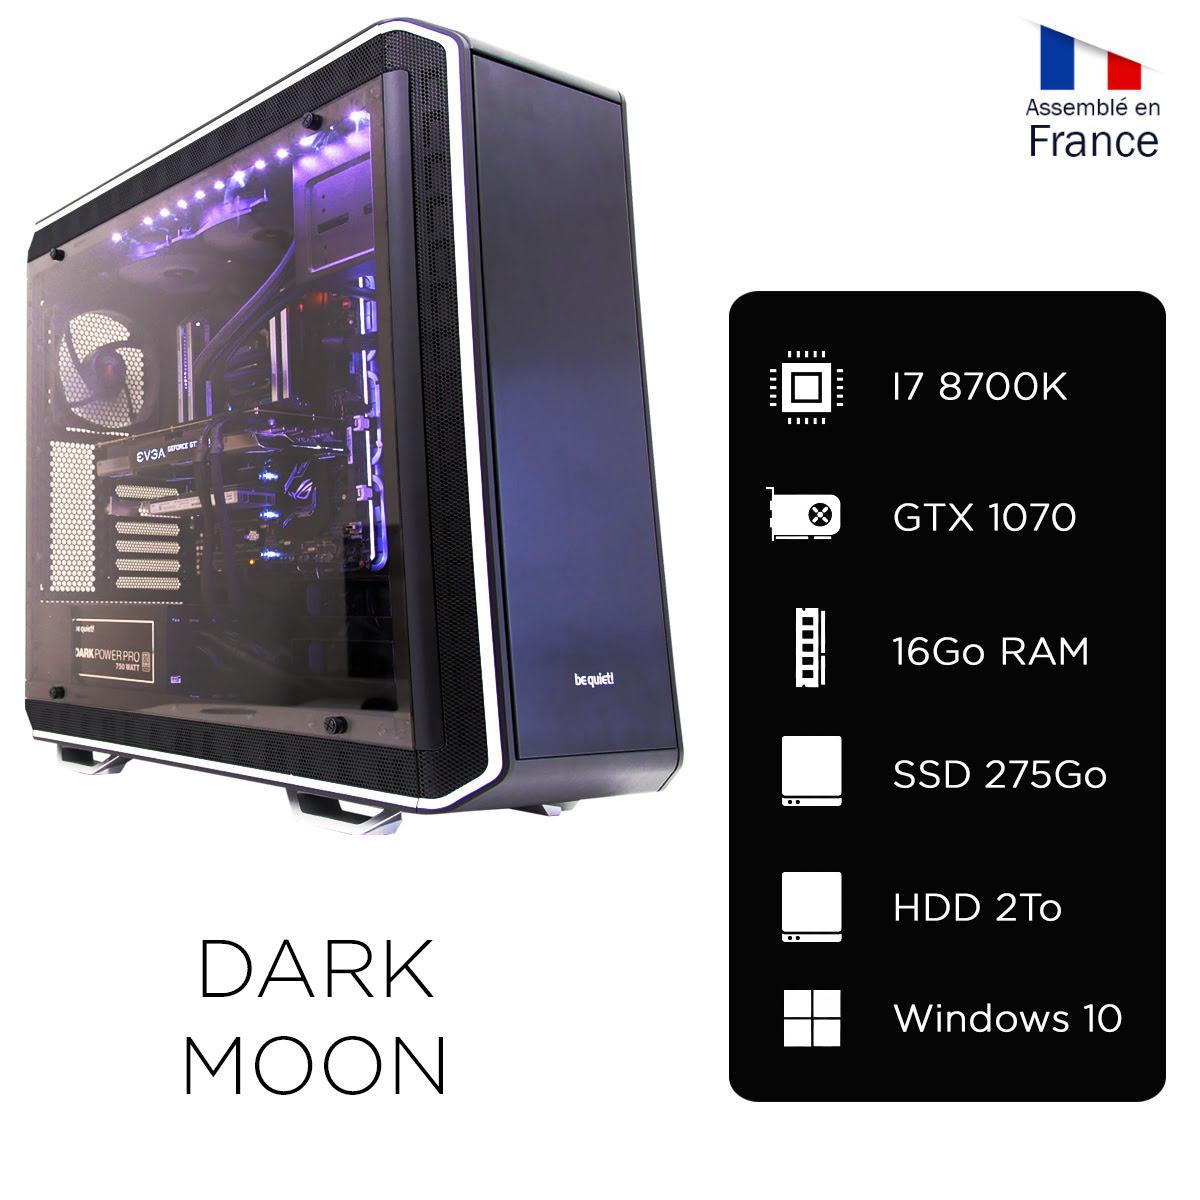 pc gamer cybertek dark moon asus nvidia gf gtx 1070 ssd 275go intel core i7 8700k. Black Bedroom Furniture Sets. Home Design Ideas